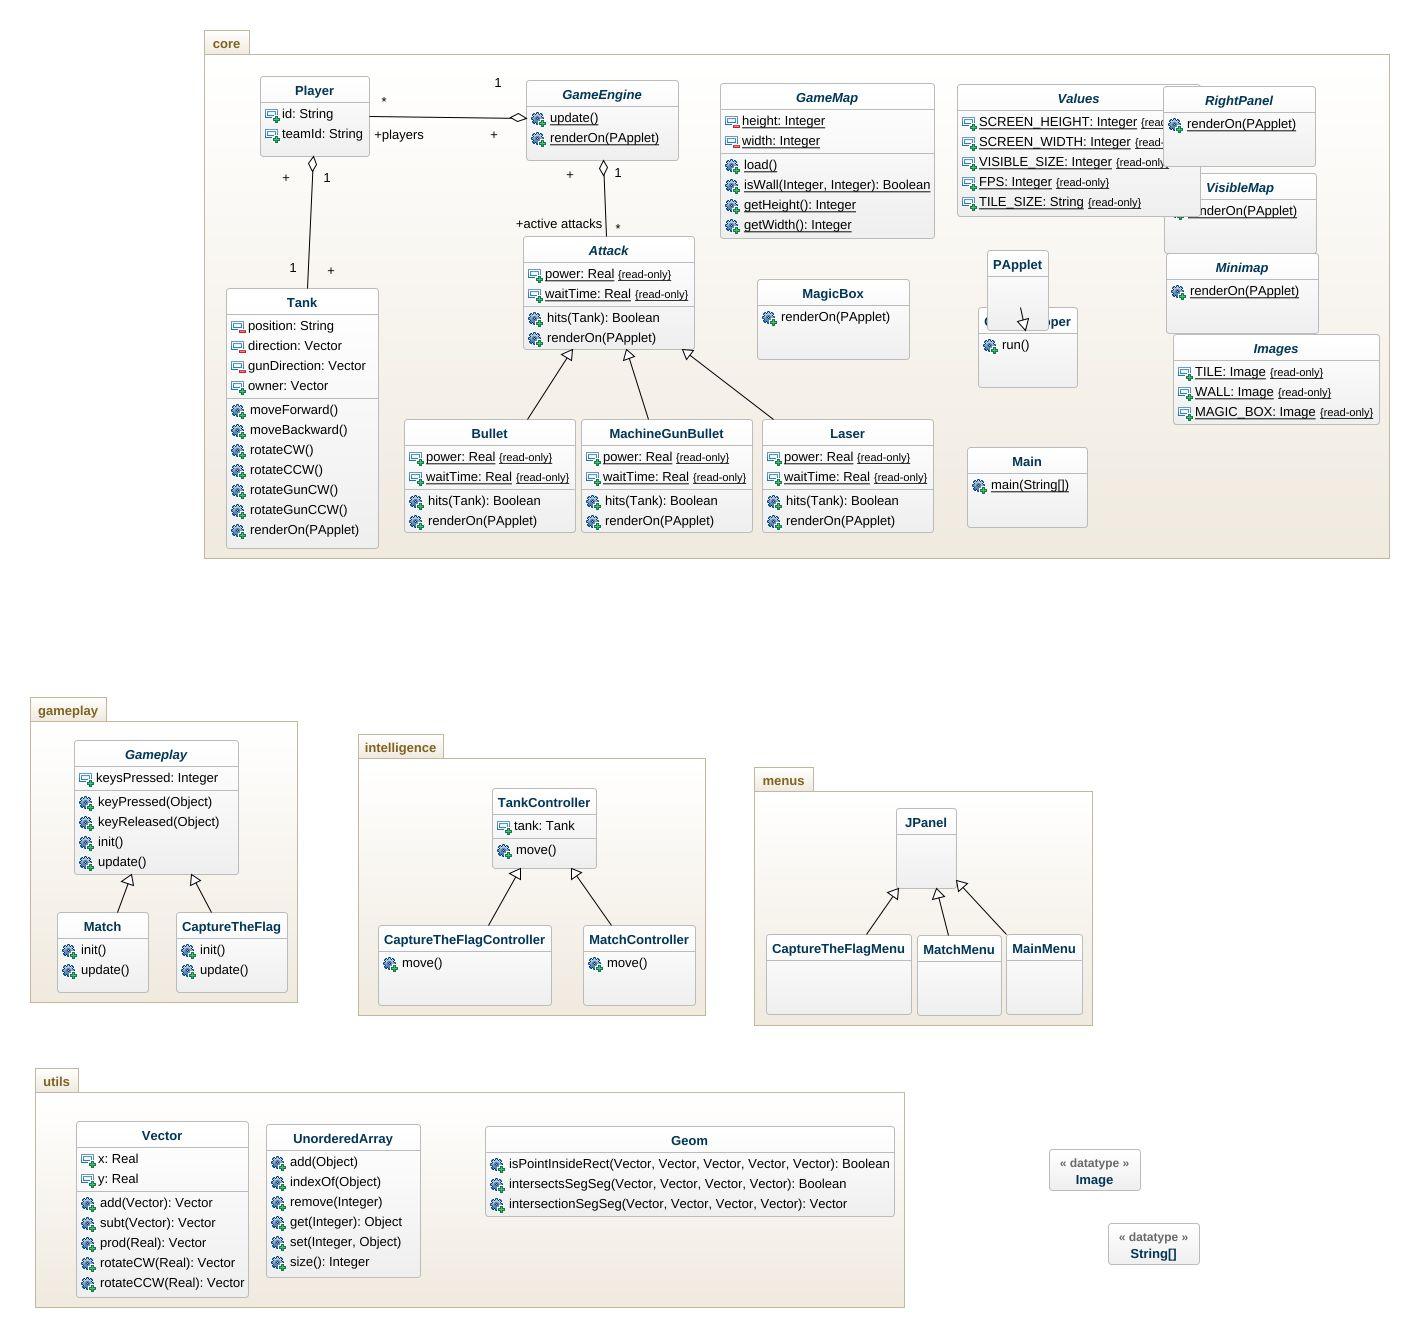 tanks uml diagram tanks uml example uml tanks online diagram example  jpeg png svg tanks diag